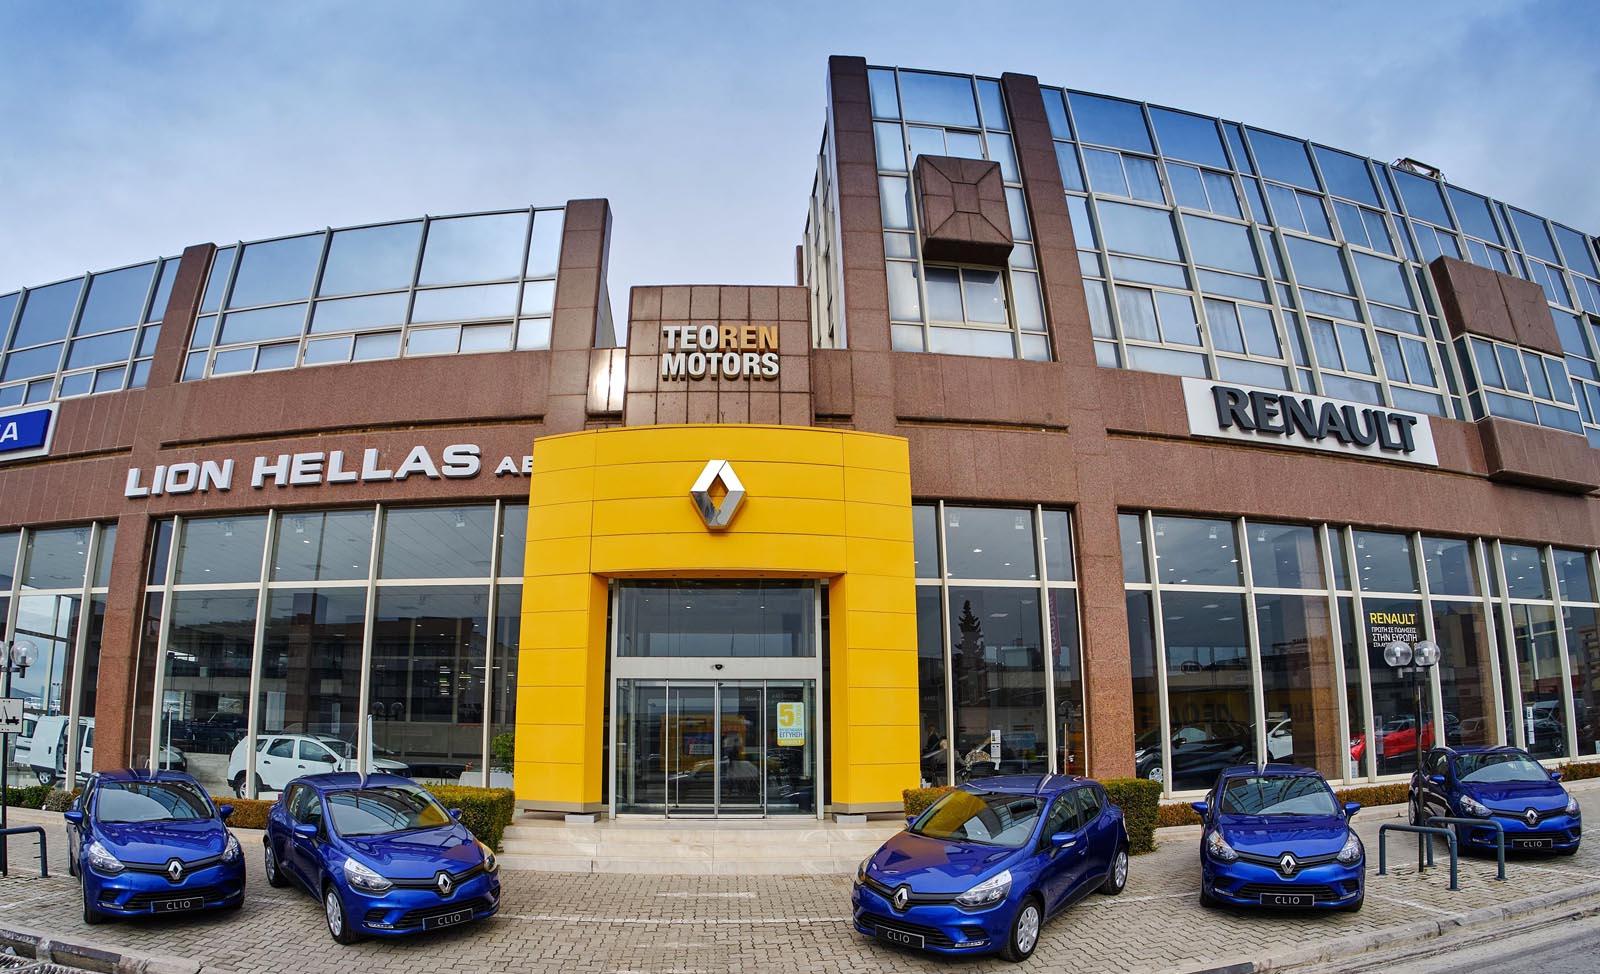 Photo of Renault – Teoren Motors: Παραδόθηκαν τα 5 Renault Clio στους κληρωθέντες πυροπαθείς